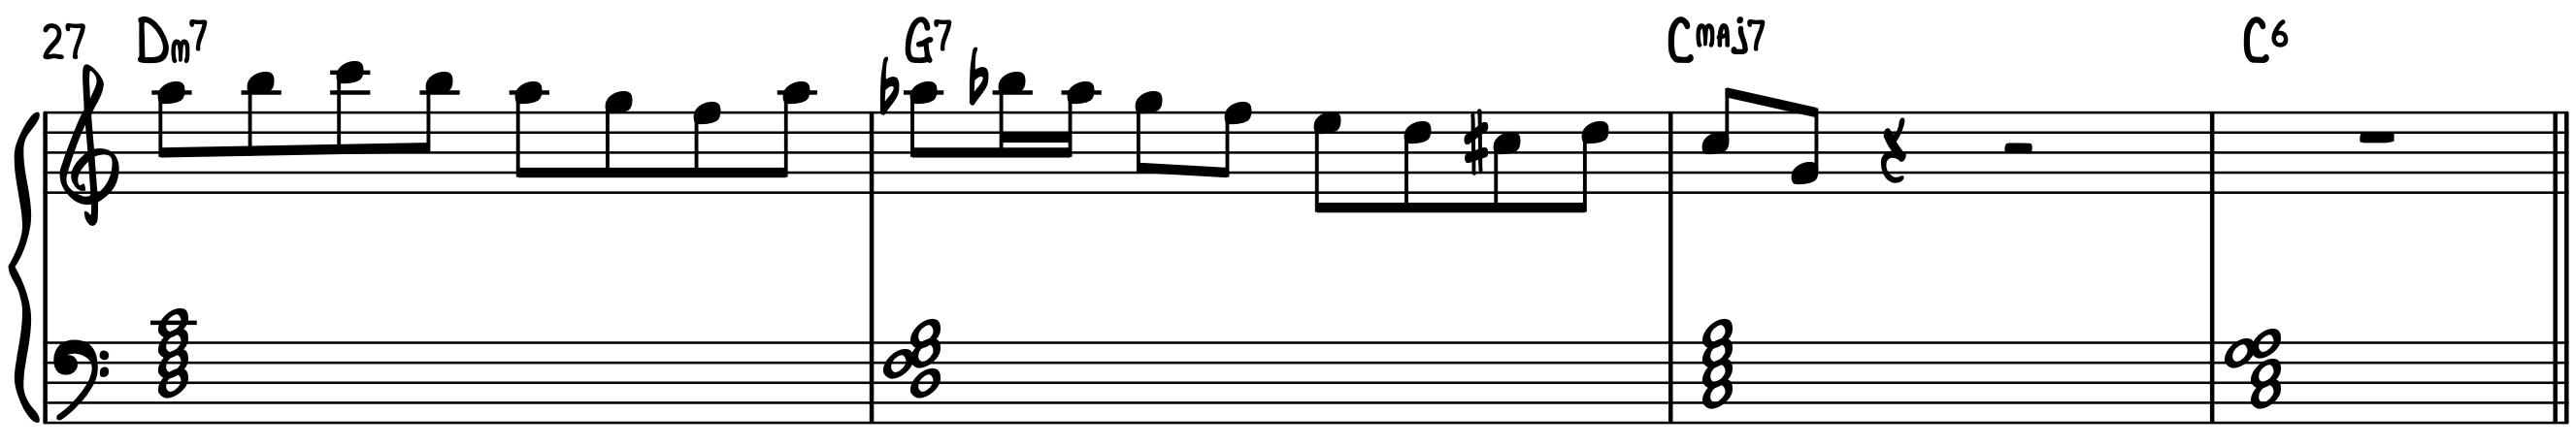 Improv Example 2